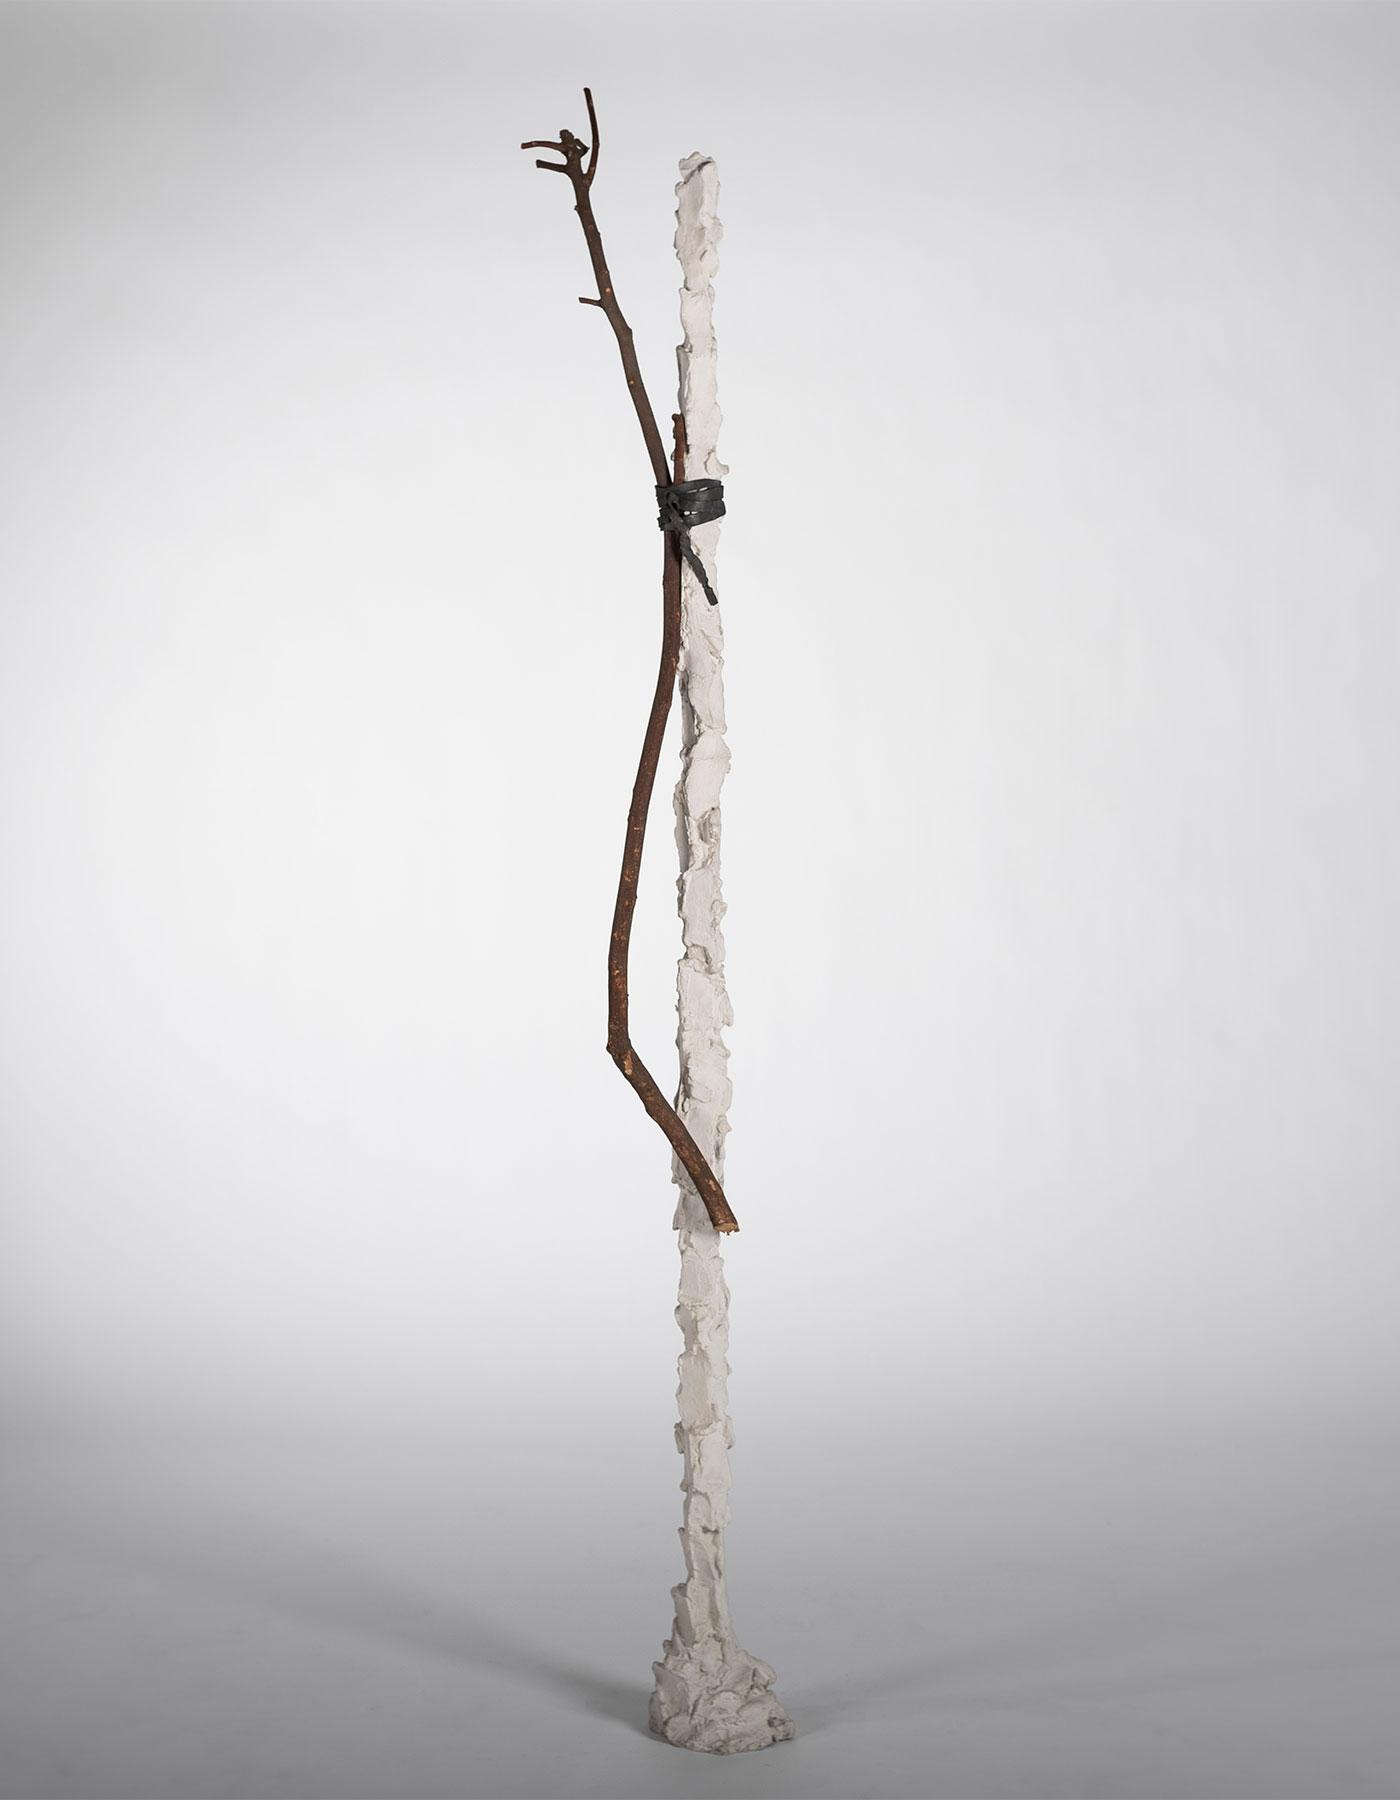 Paolo Icaro |  Innesto - Stele sculpture